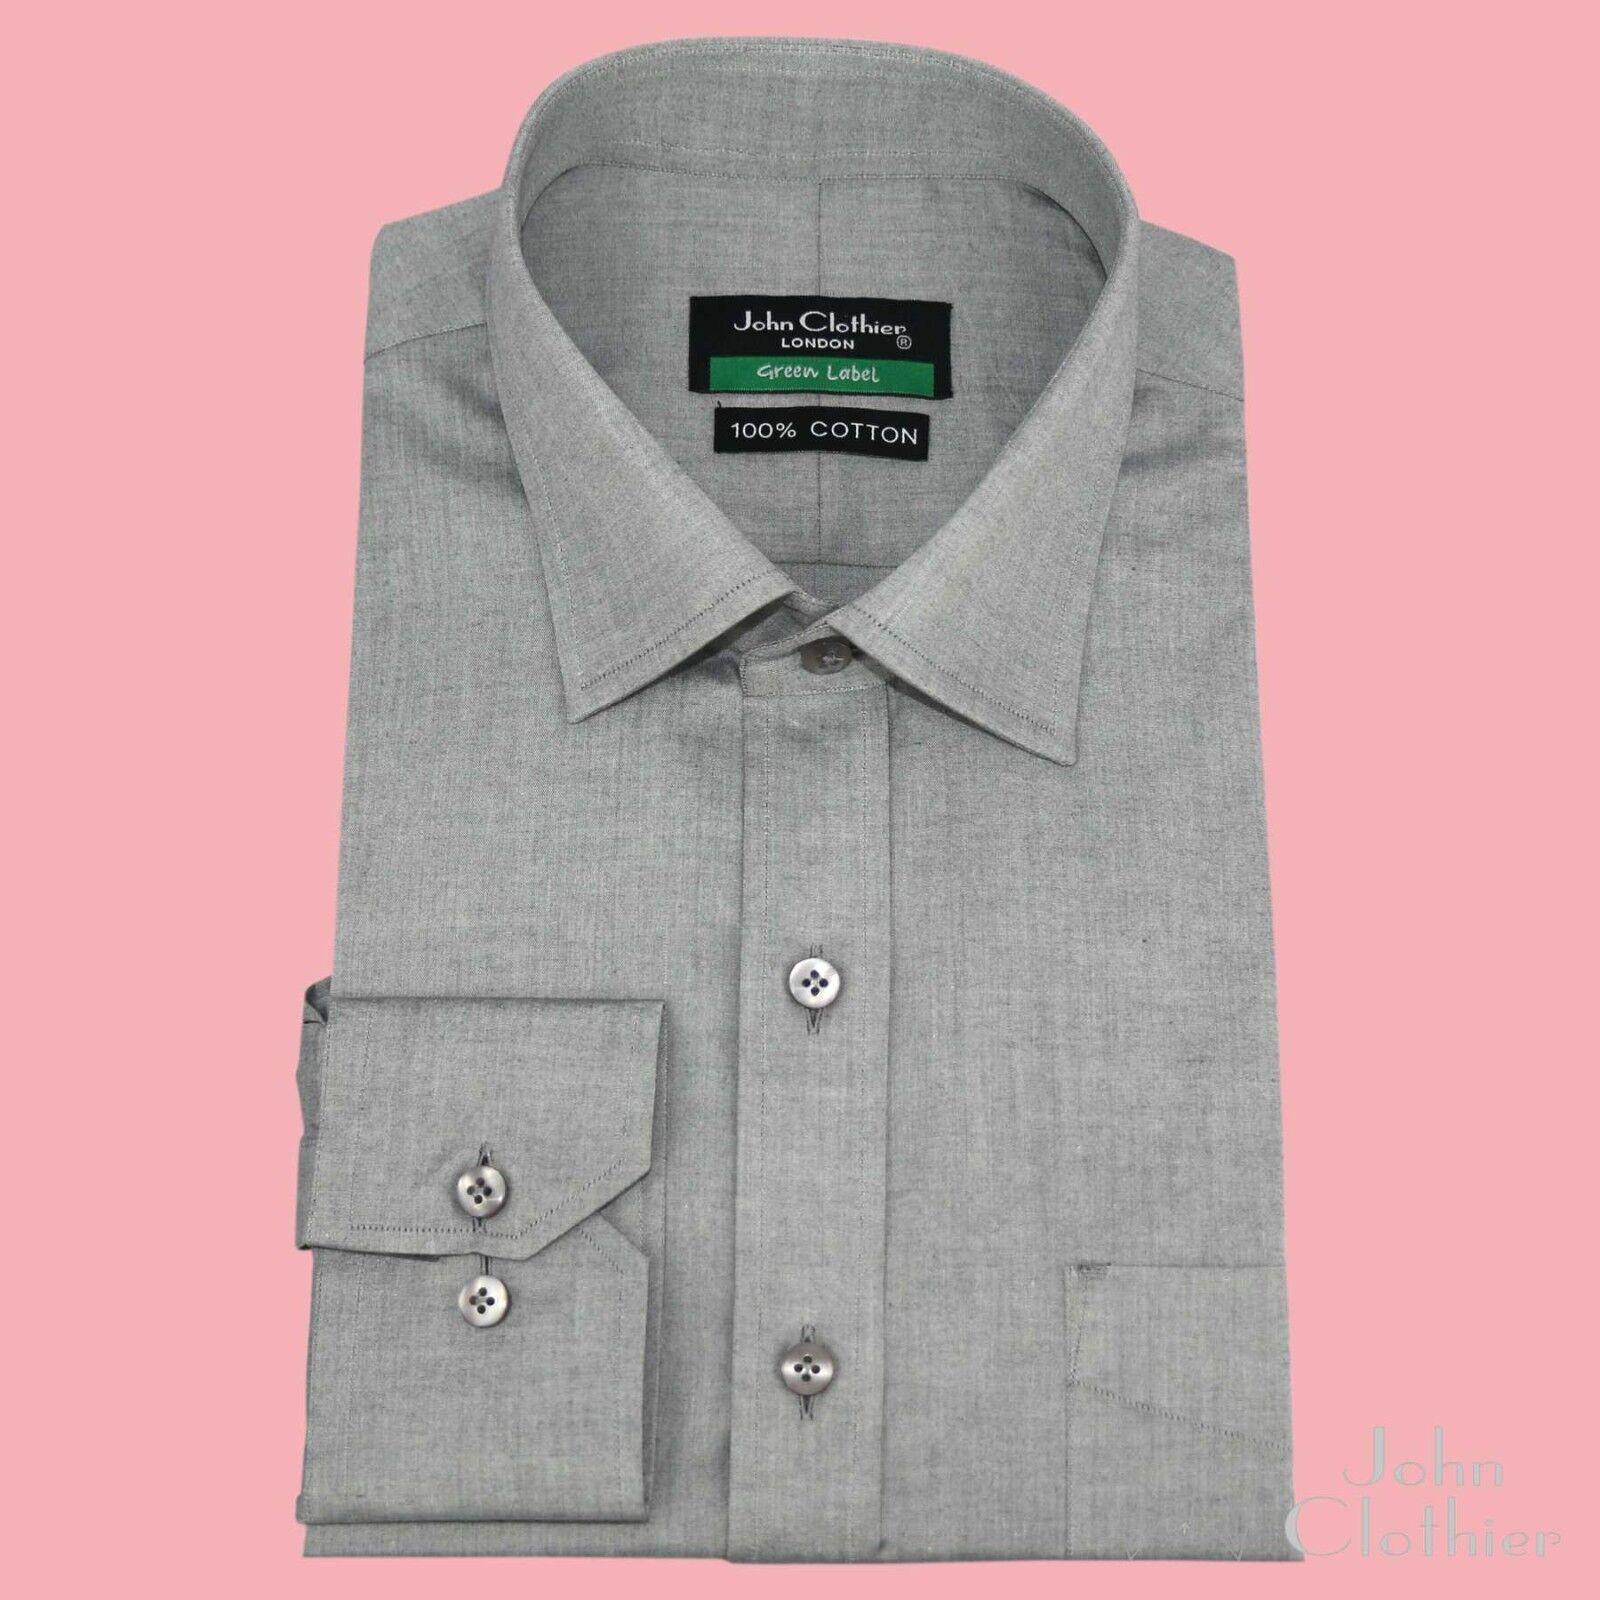 New Grau Milange Soft Cotton  Herren Shirts Semi Spread Cut Away collar Long sleeve